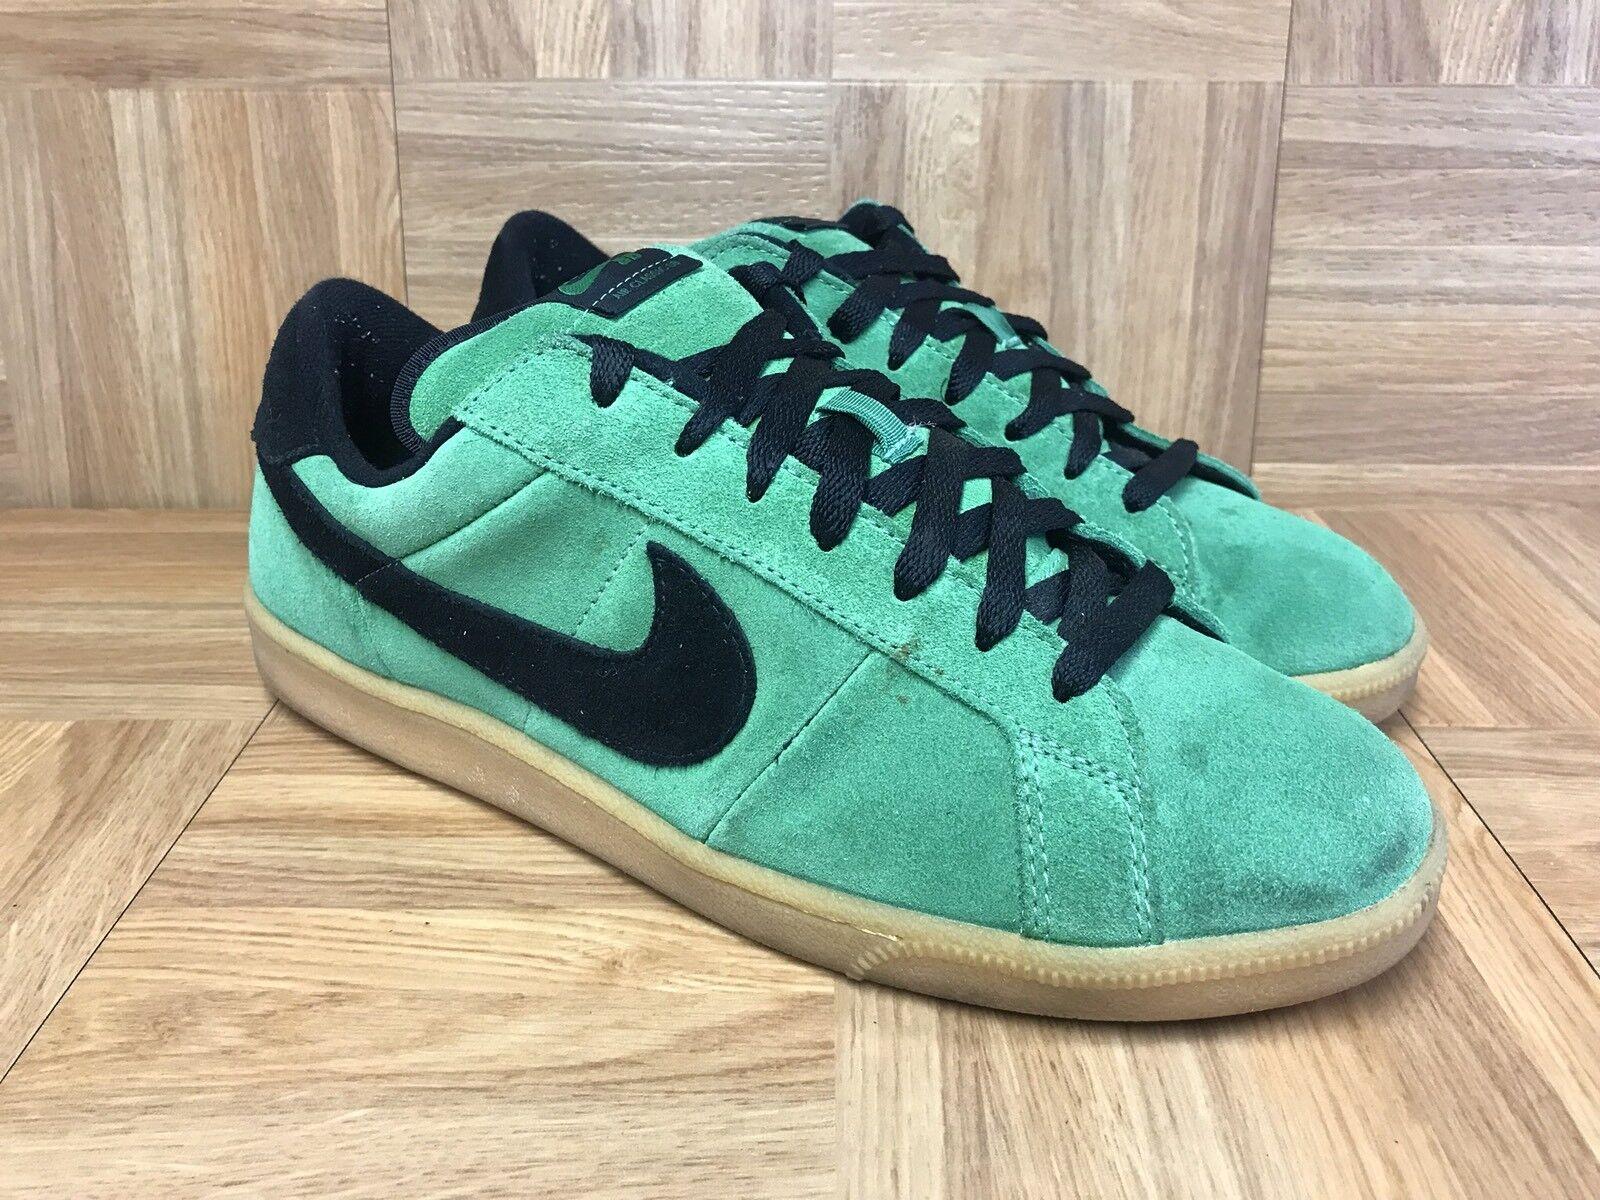 RARE Nike Air Classic SB Suede Classic Green Black Gum Soles Sz 11 310704-301